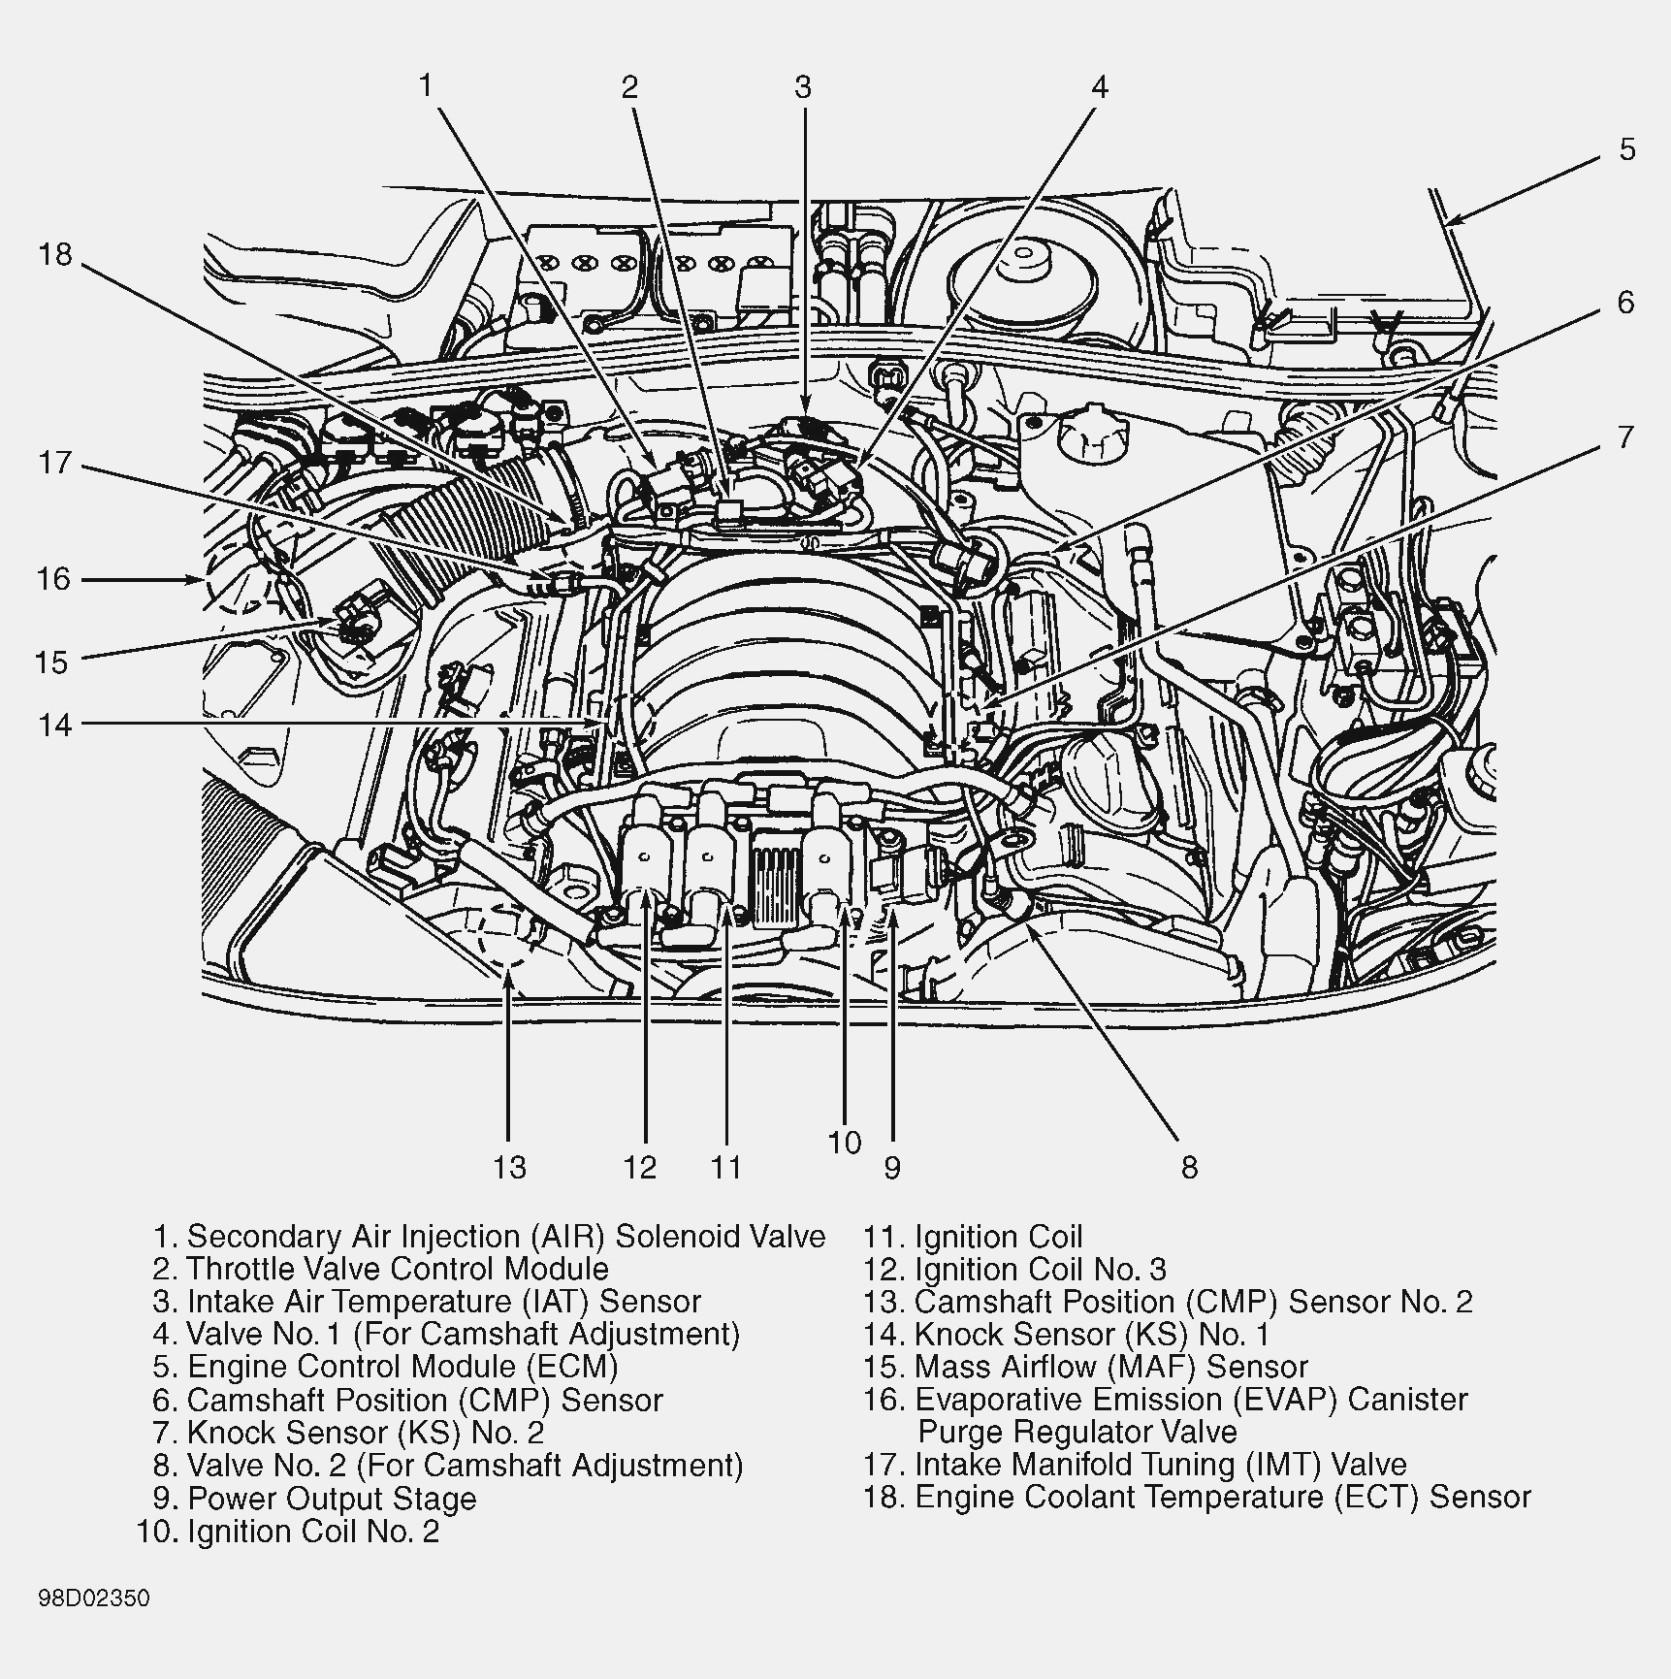 2003 ford Explorer Engine Diagram 6 0 Engine Bay Diagram Wiring Diagram toolbox Of 2003 ford Explorer Engine Diagram